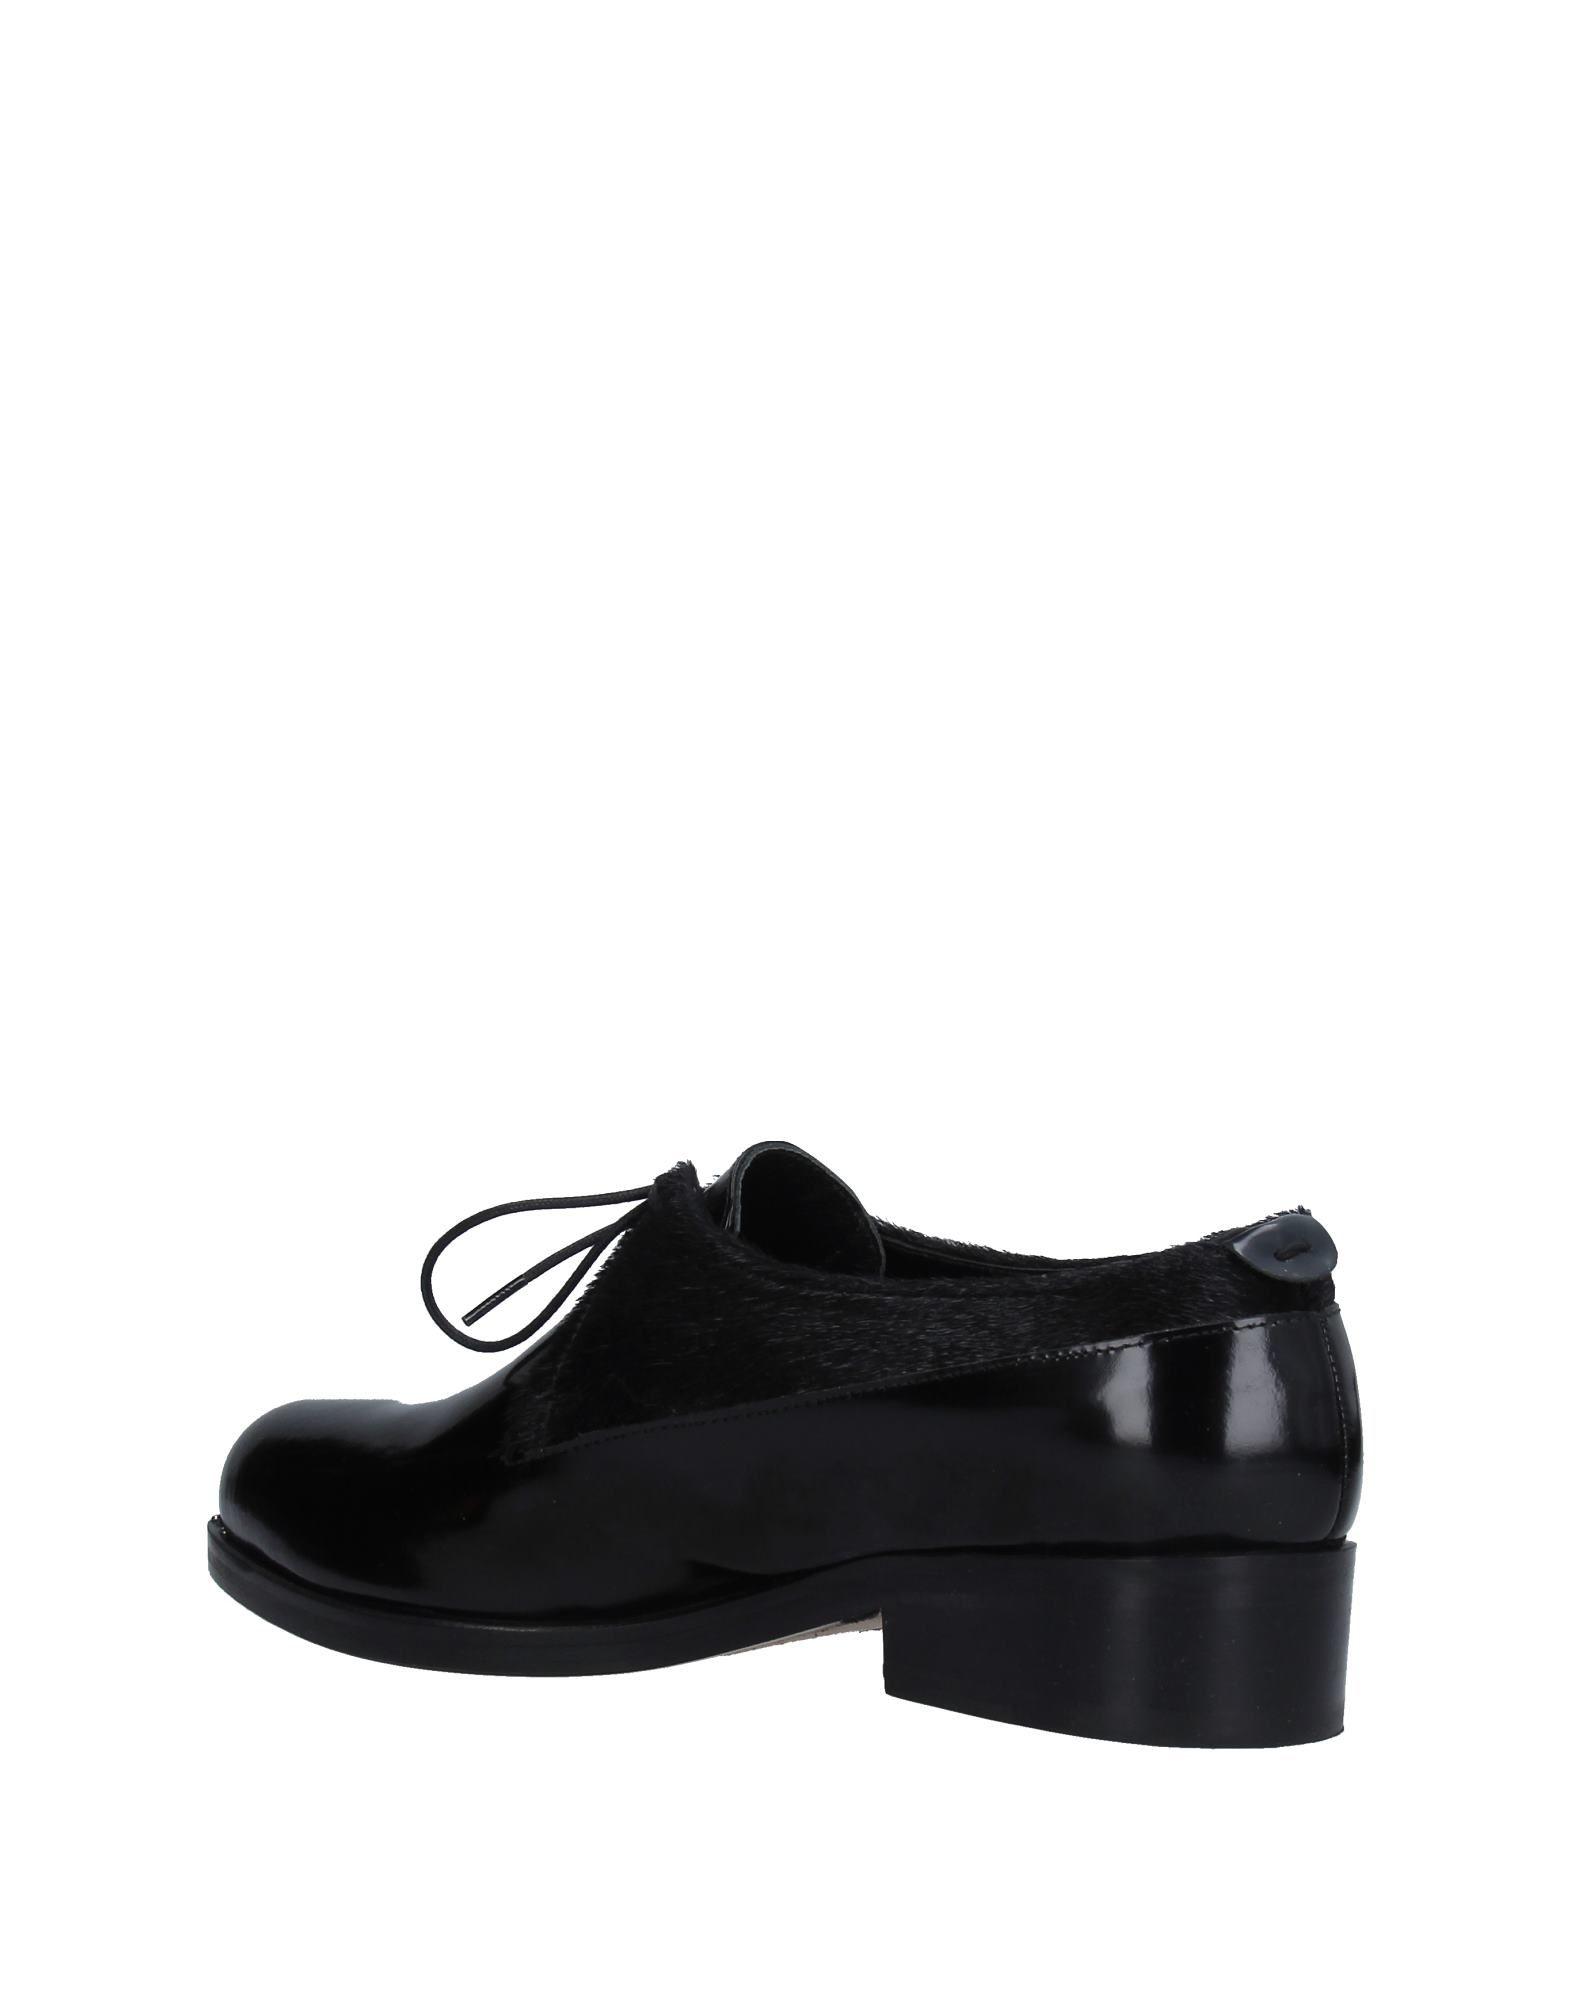 Rêve D'un Jour Schnürschuhe Schuhe Damen  11220886IL Neue Schuhe Schnürschuhe ea27c0